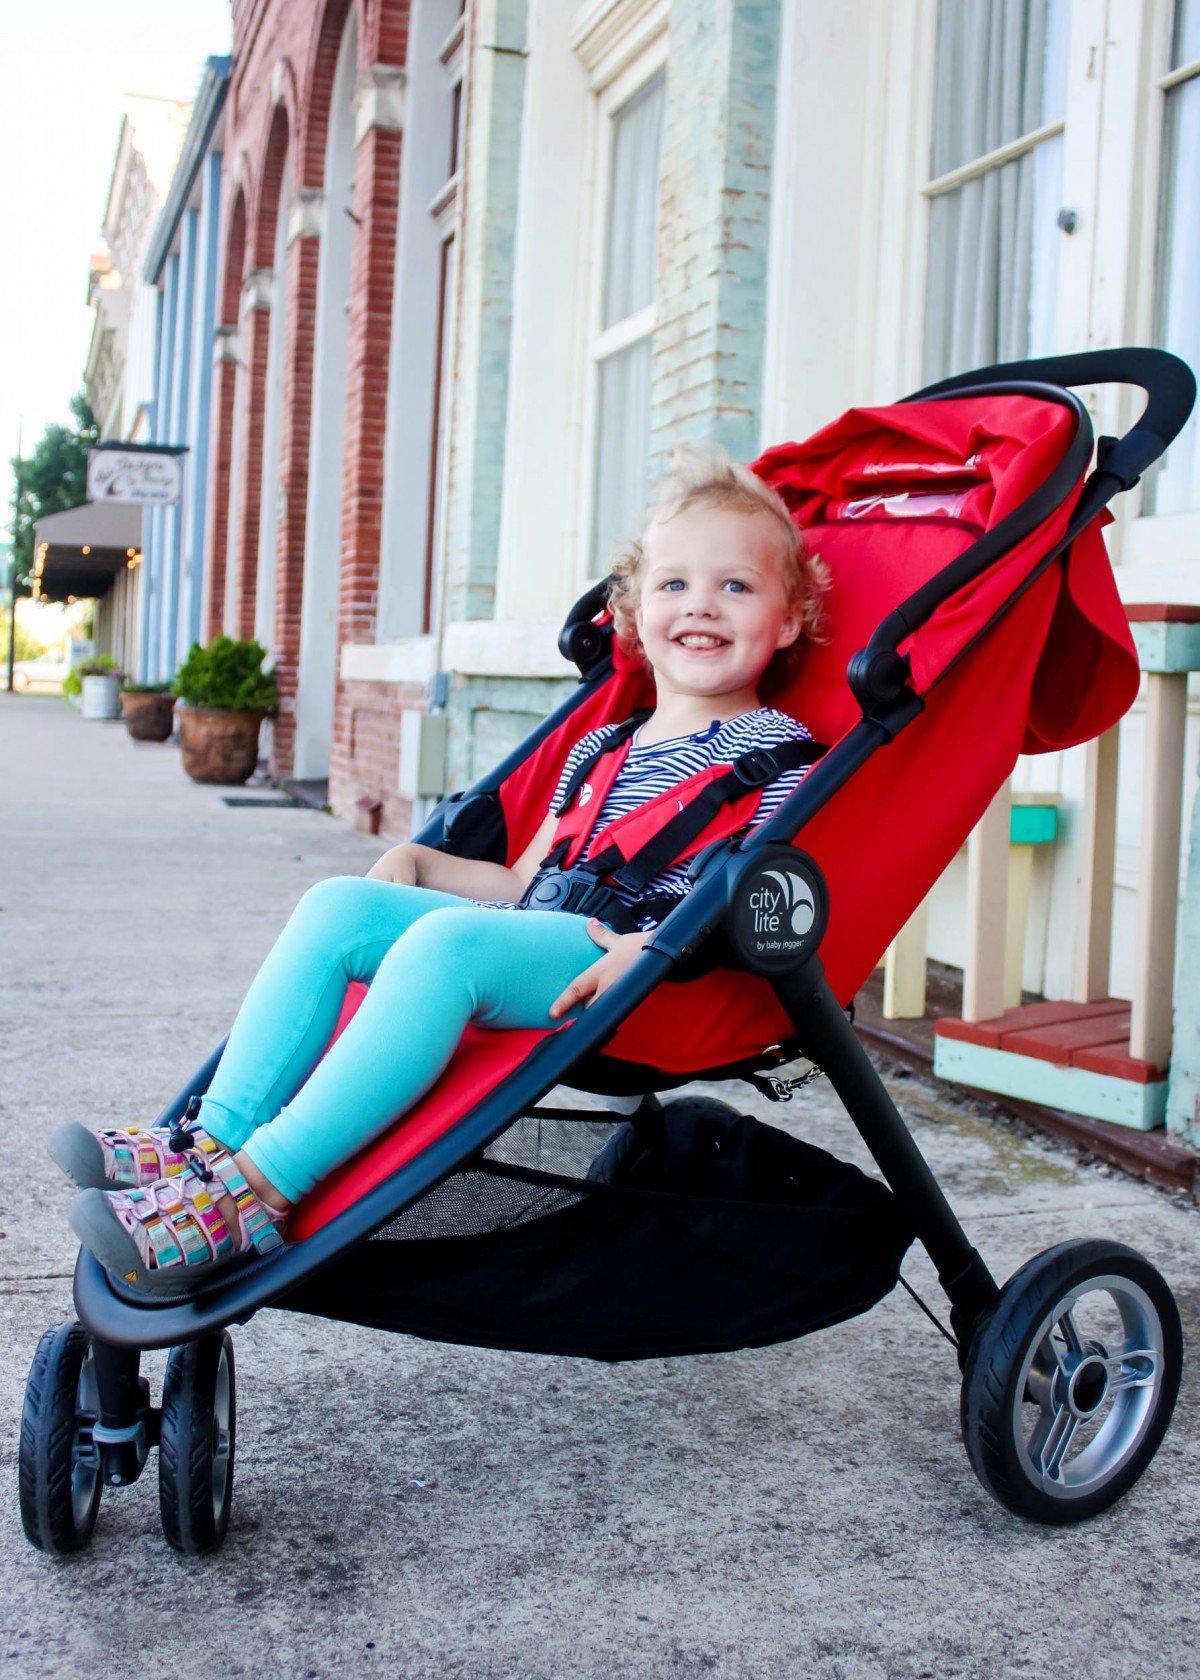 City Lite Stroller-2